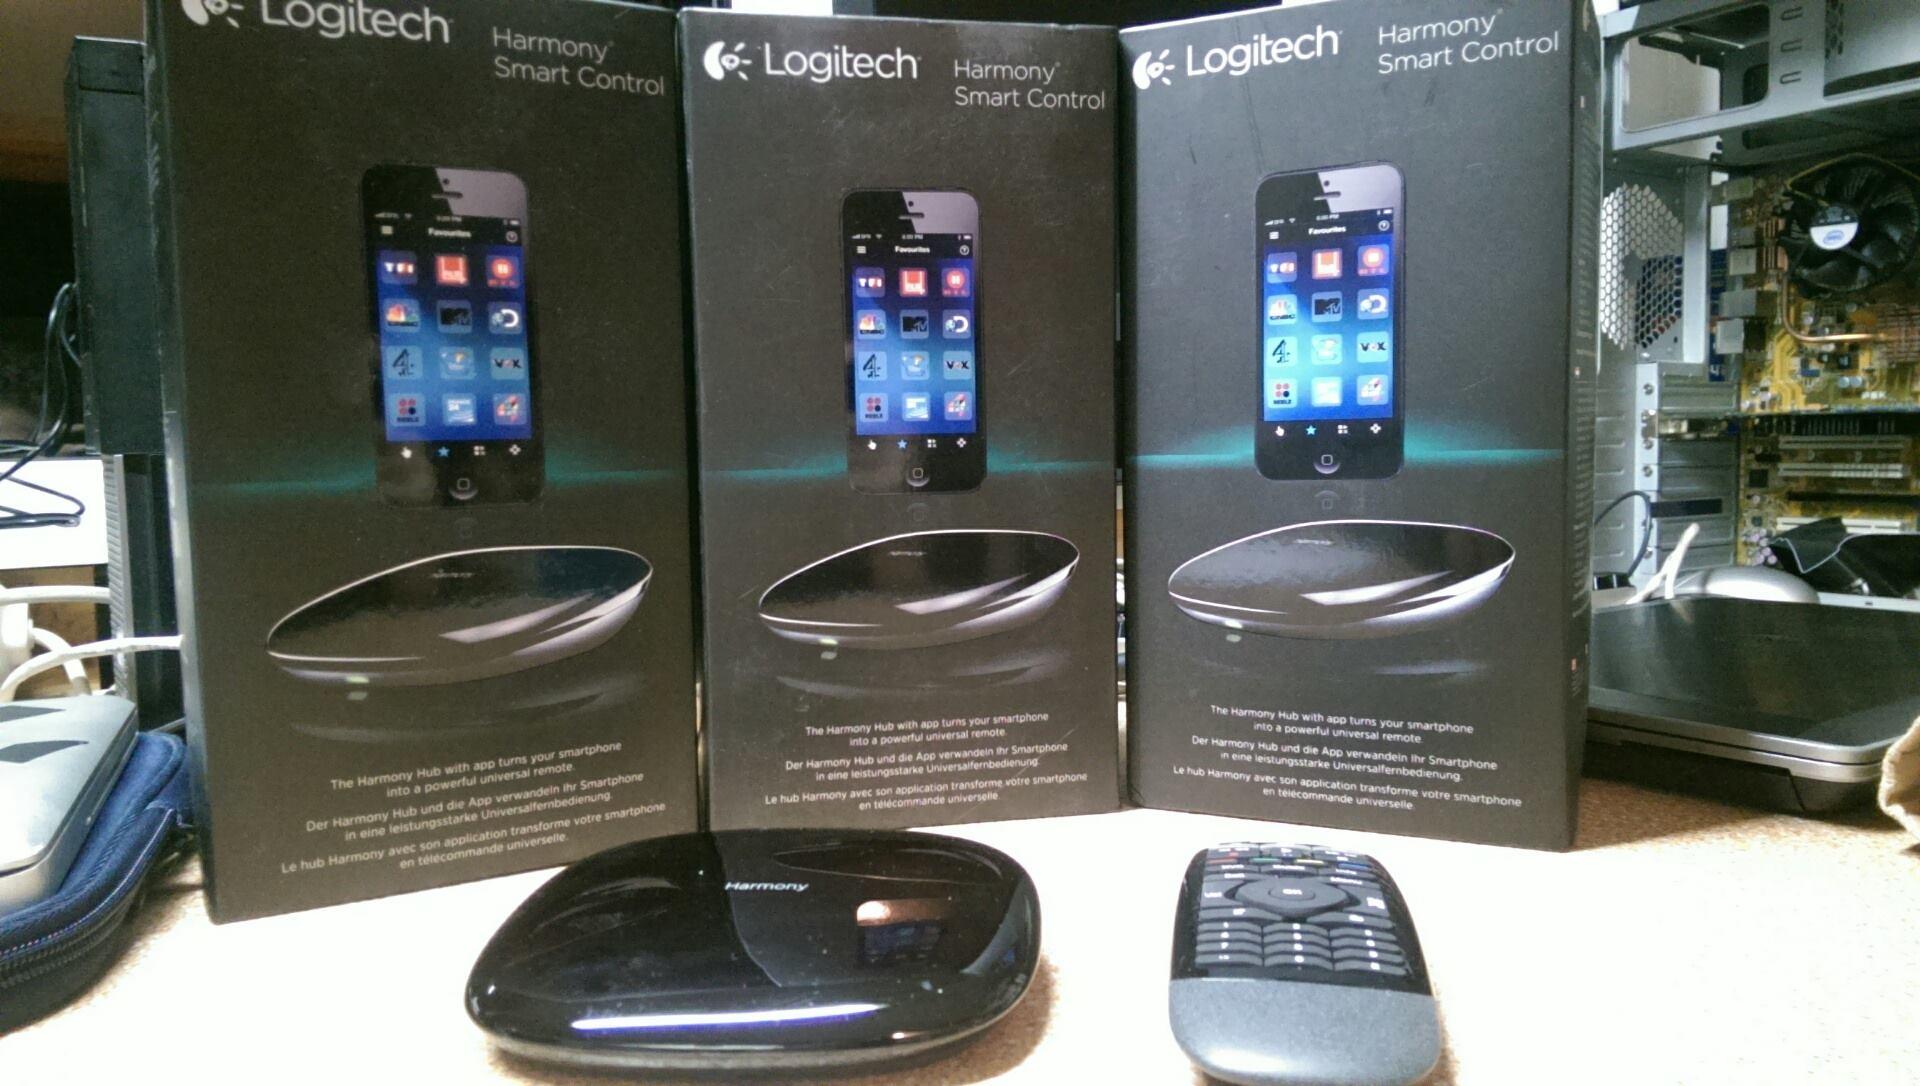 AANBIEDING: Logitech Harmony Smart Control